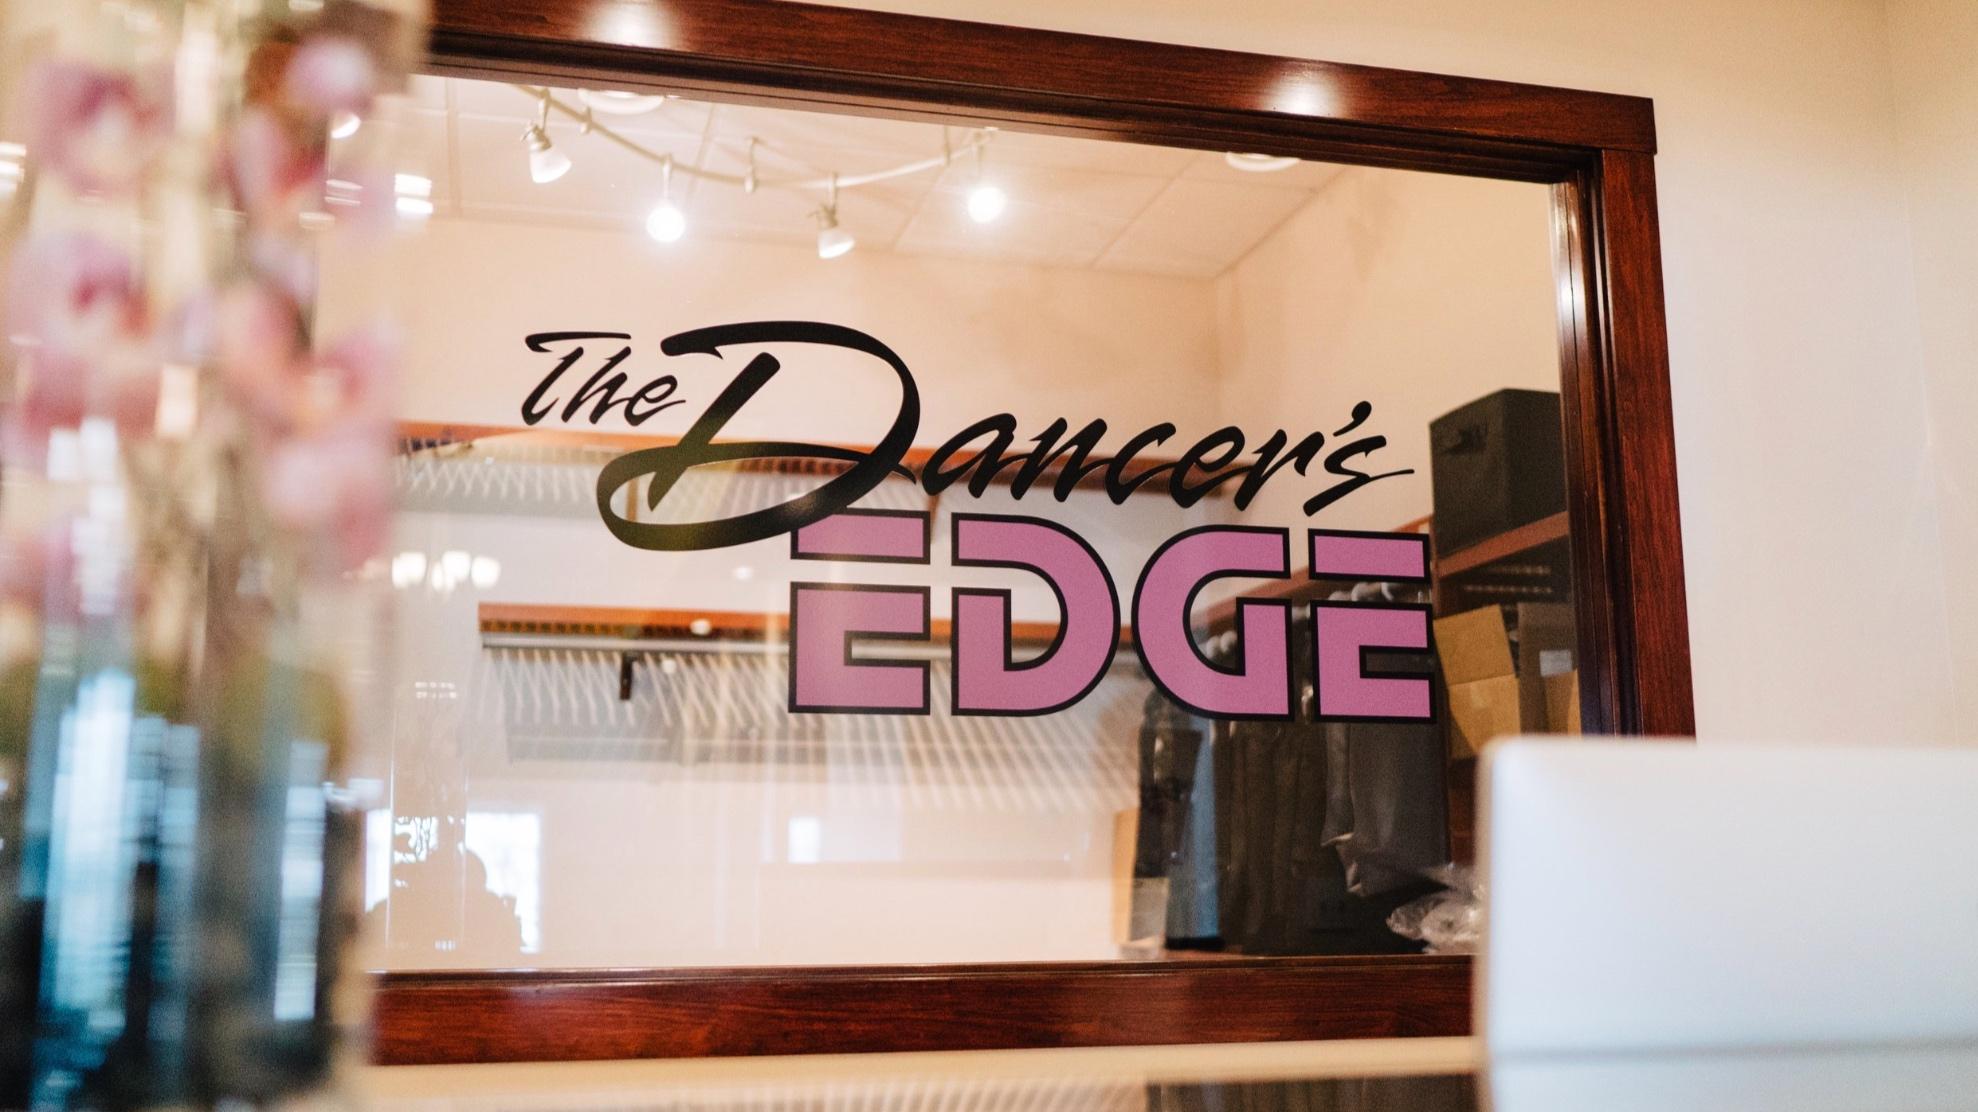 The Dancer's EDGE Front Desk